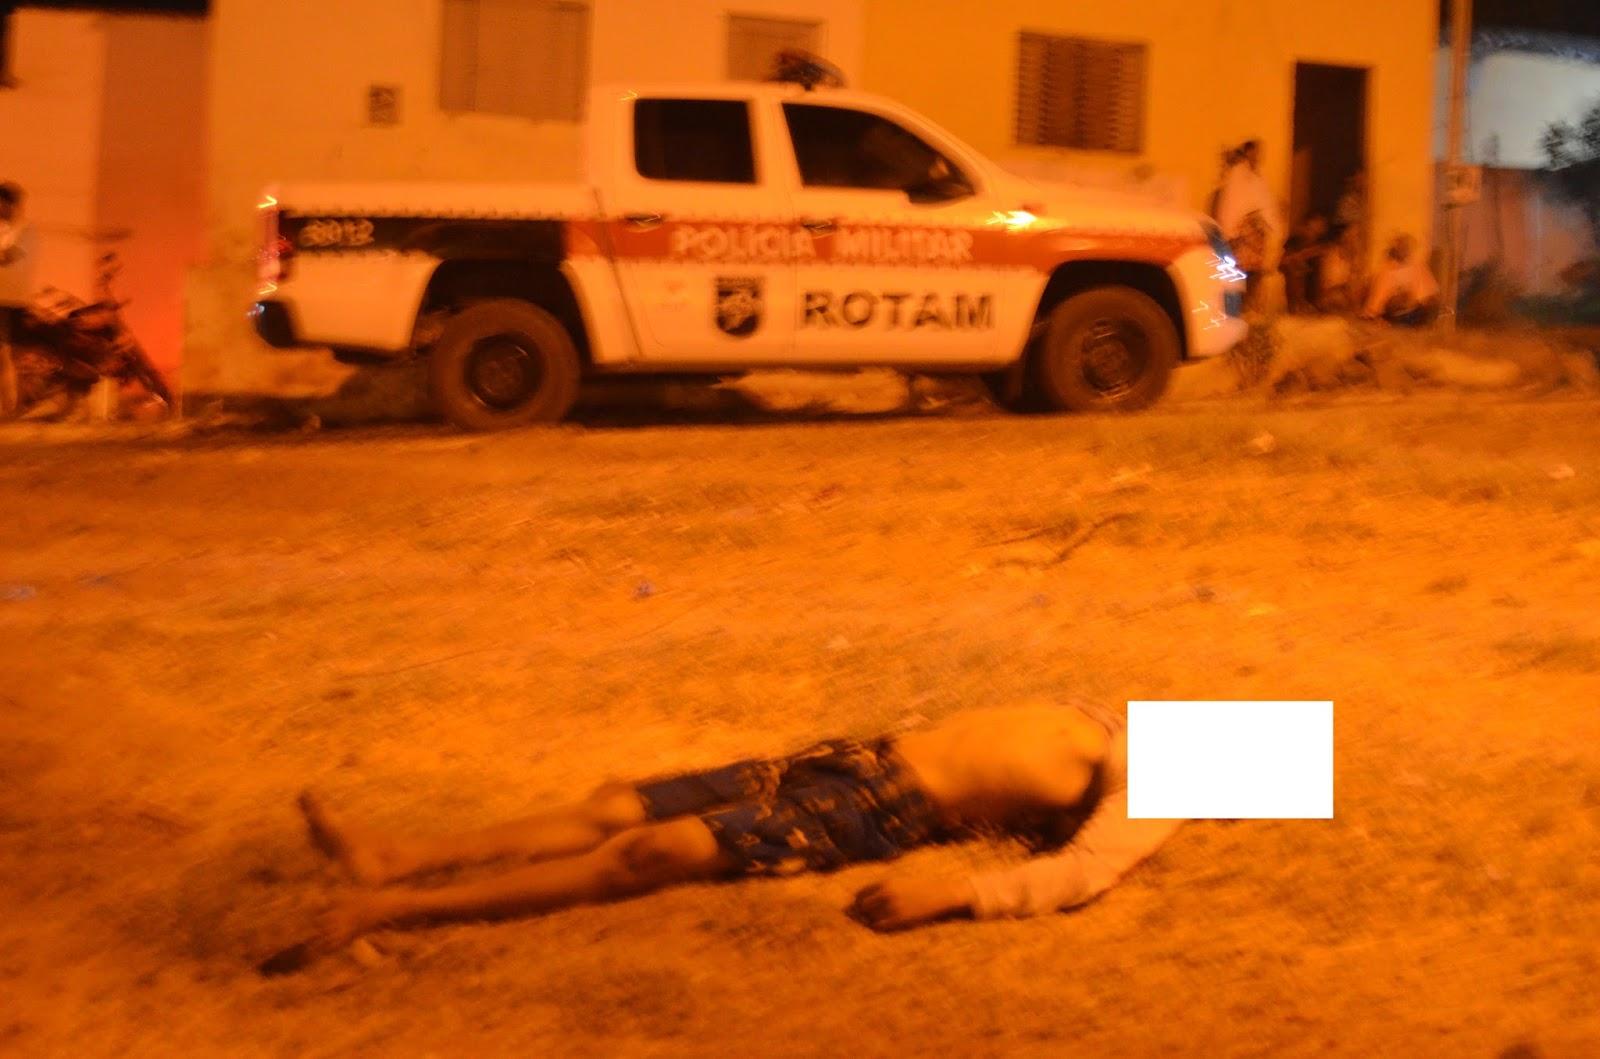 José Marcelino de Sousa tinha 22 anos (foto: Ângelo Lima)